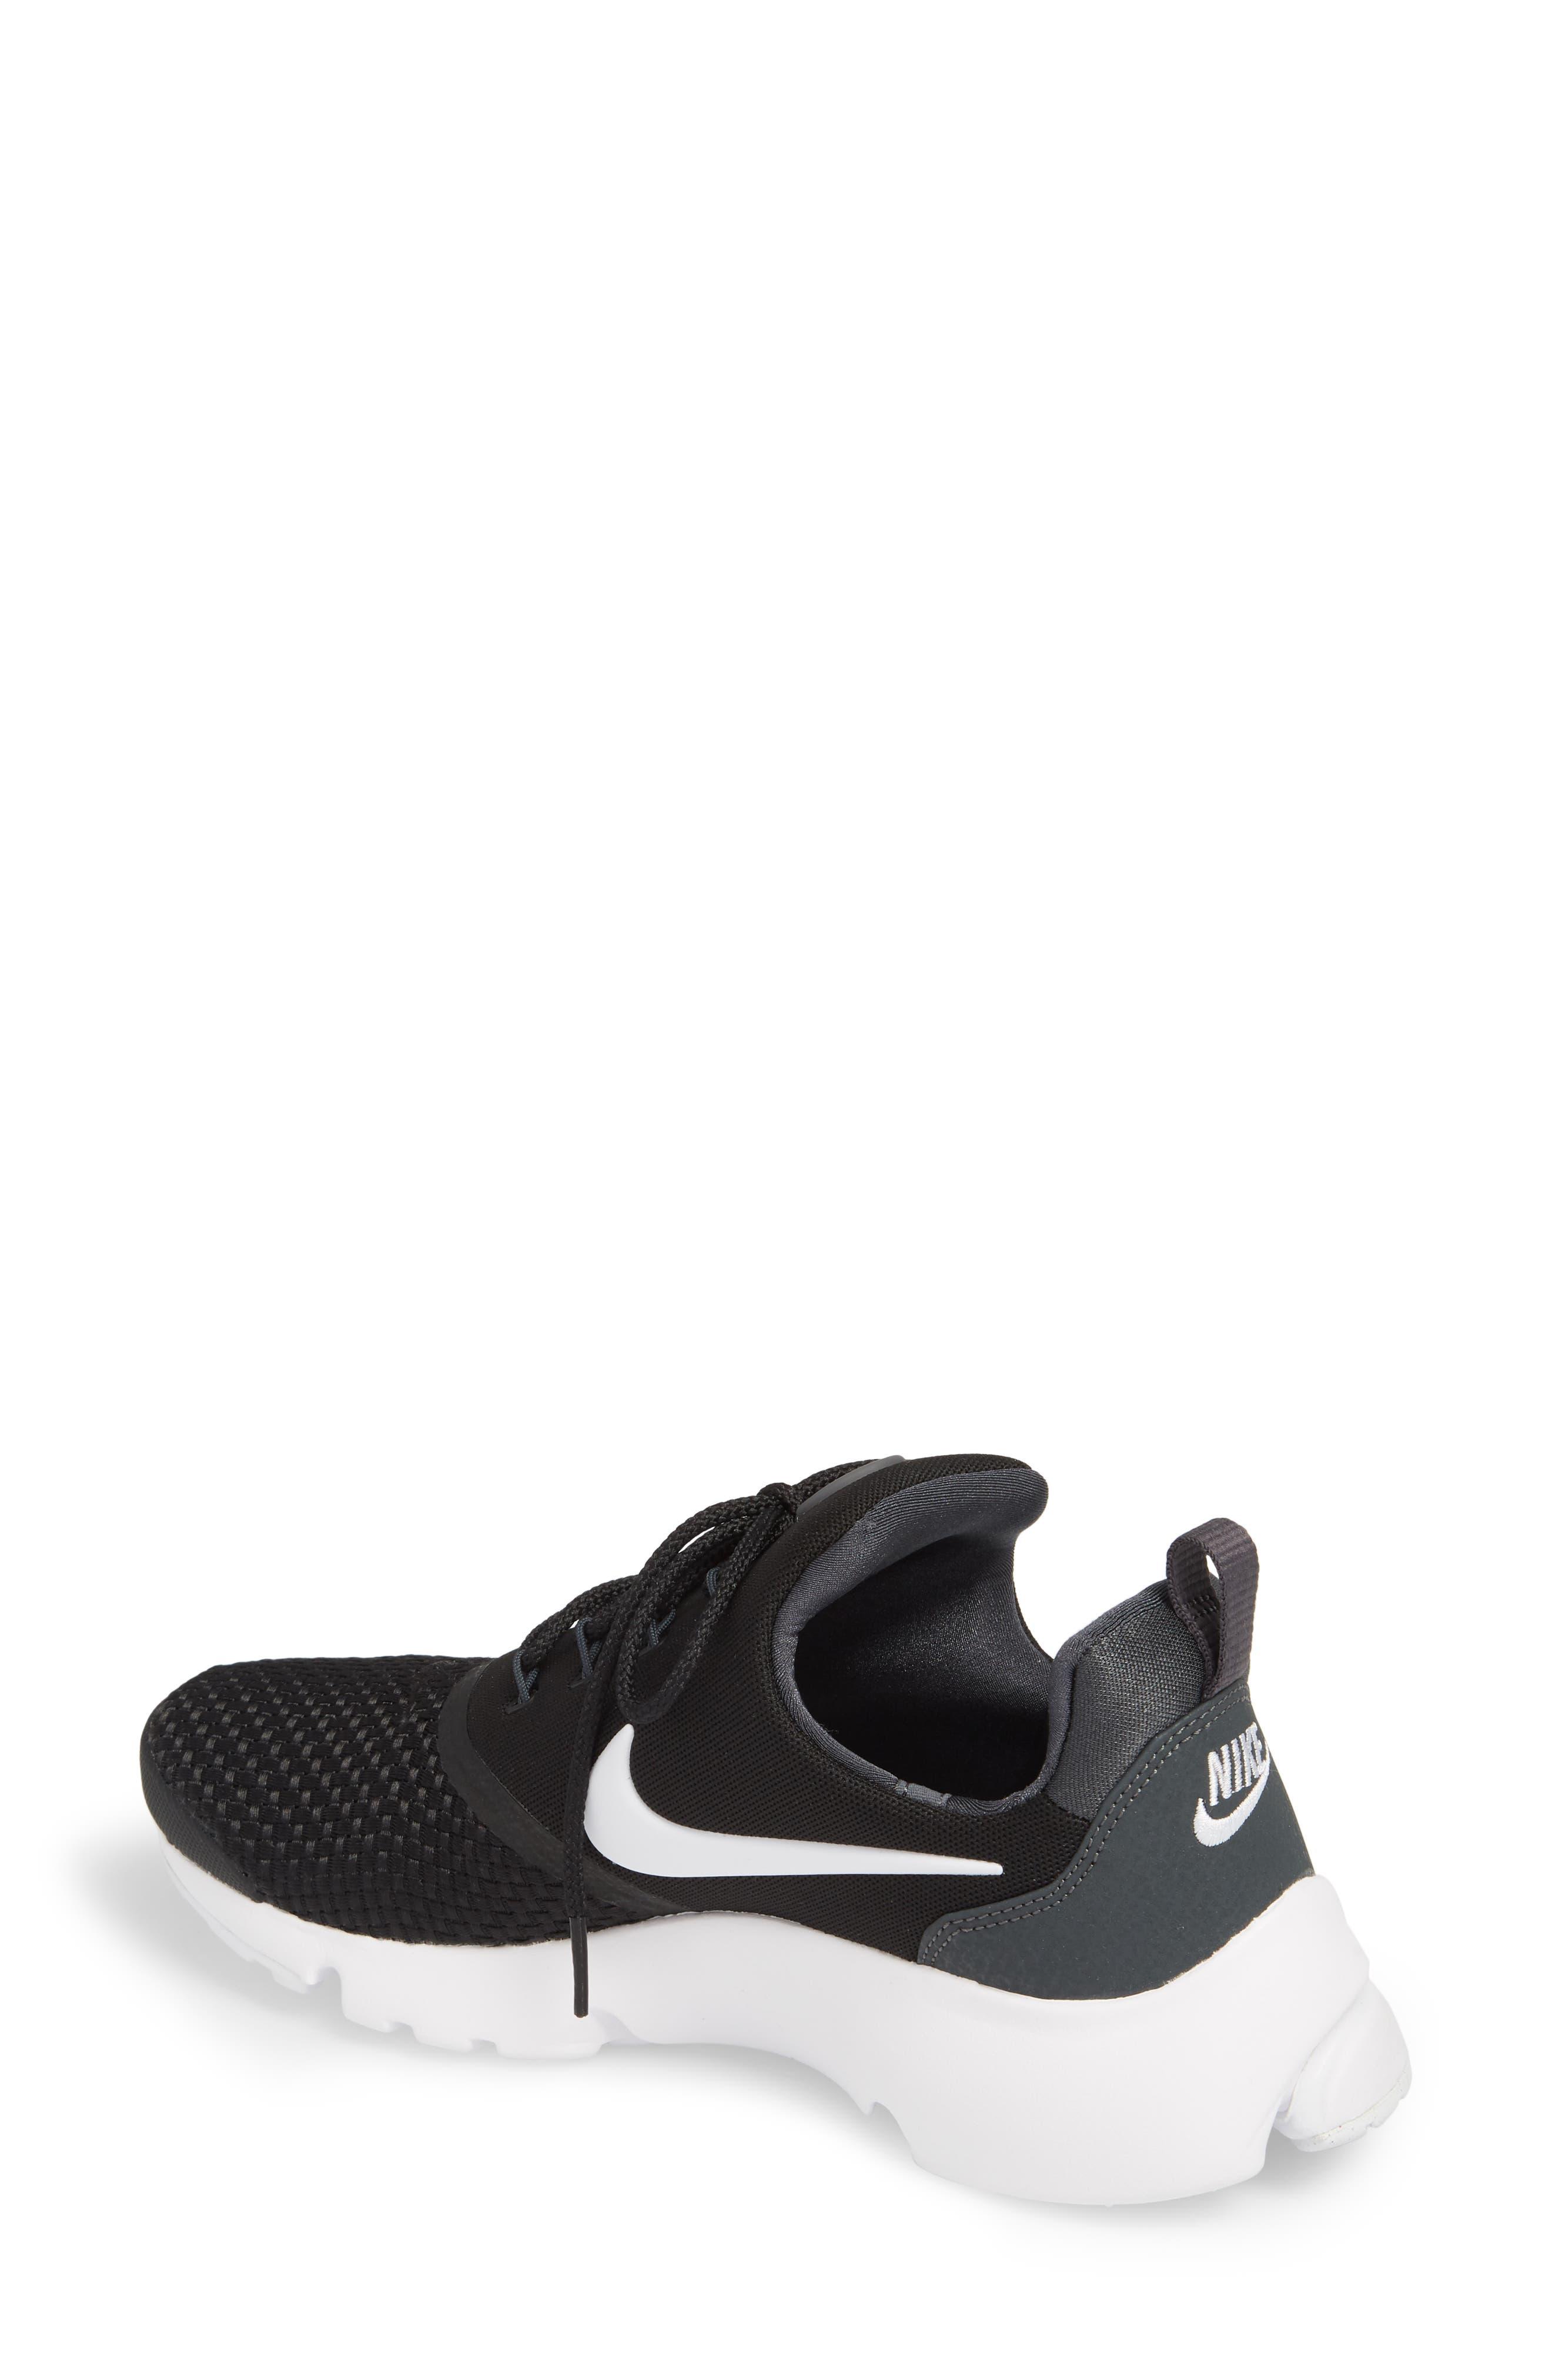 Presto Fly Sneaker,                             Alternate thumbnail 2, color,                             BLACK/ WHITE/ ANTHRACITE